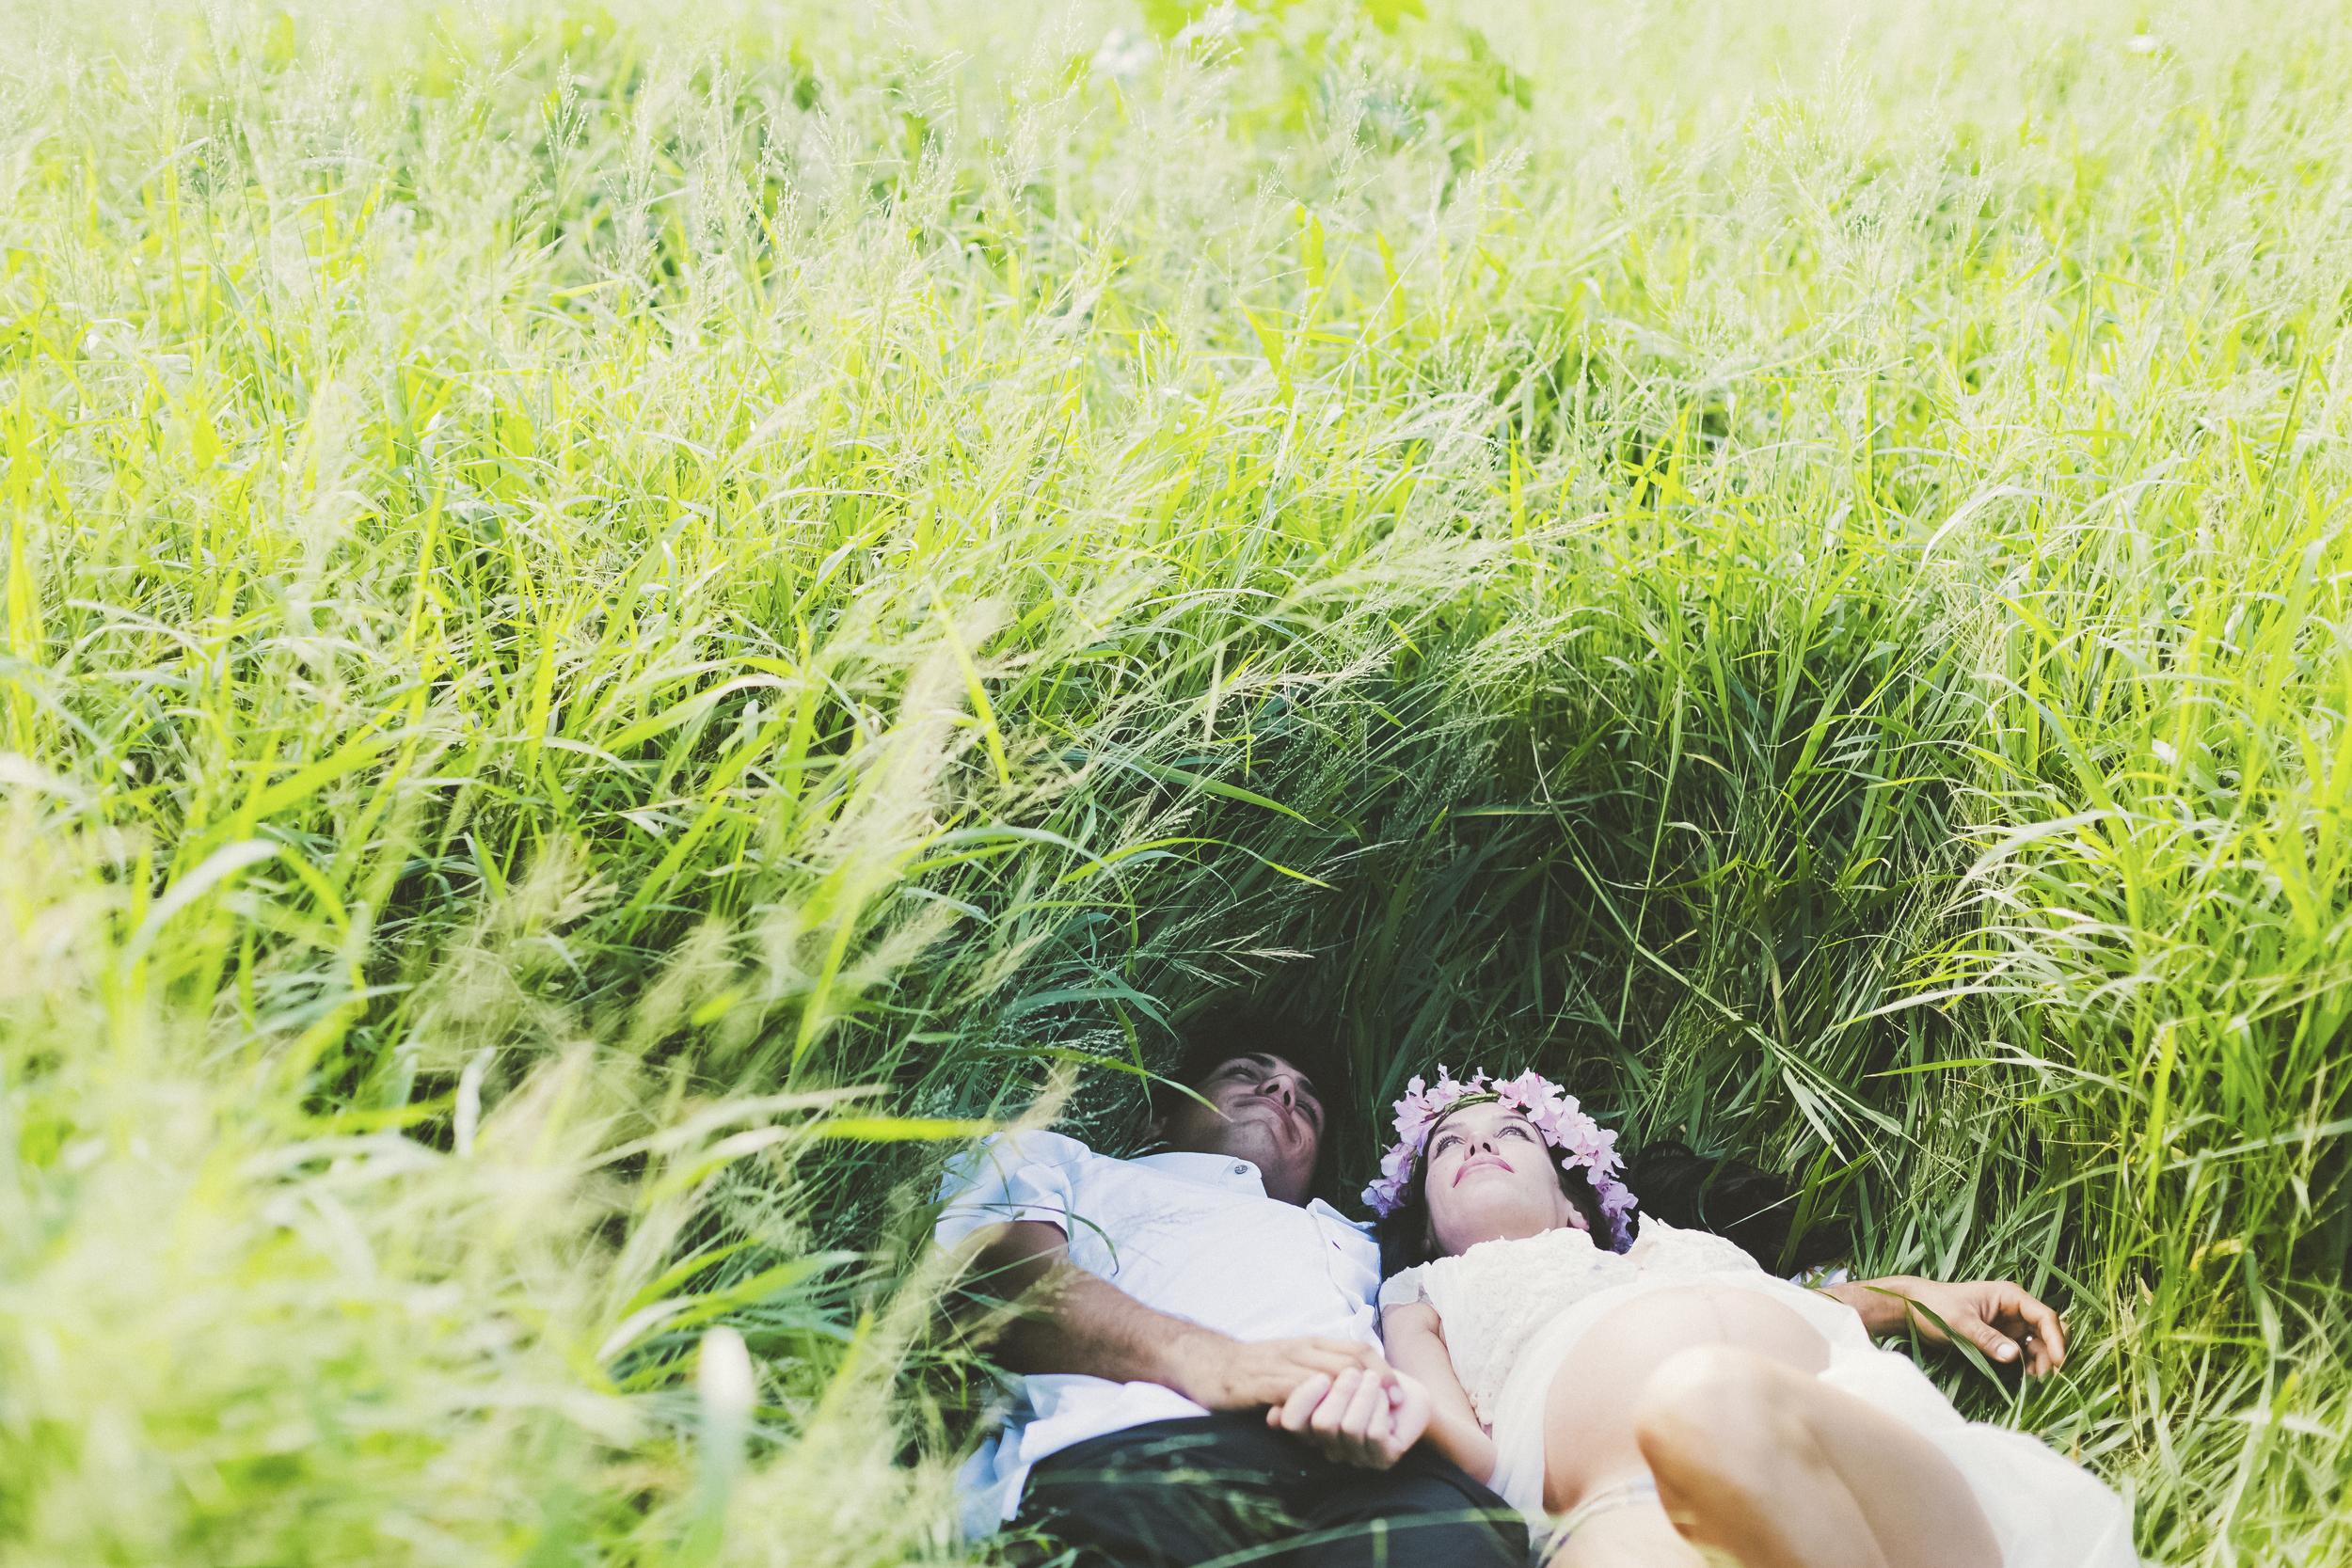 angie-diaz-photography-maui-maternity-twins-3.jpg